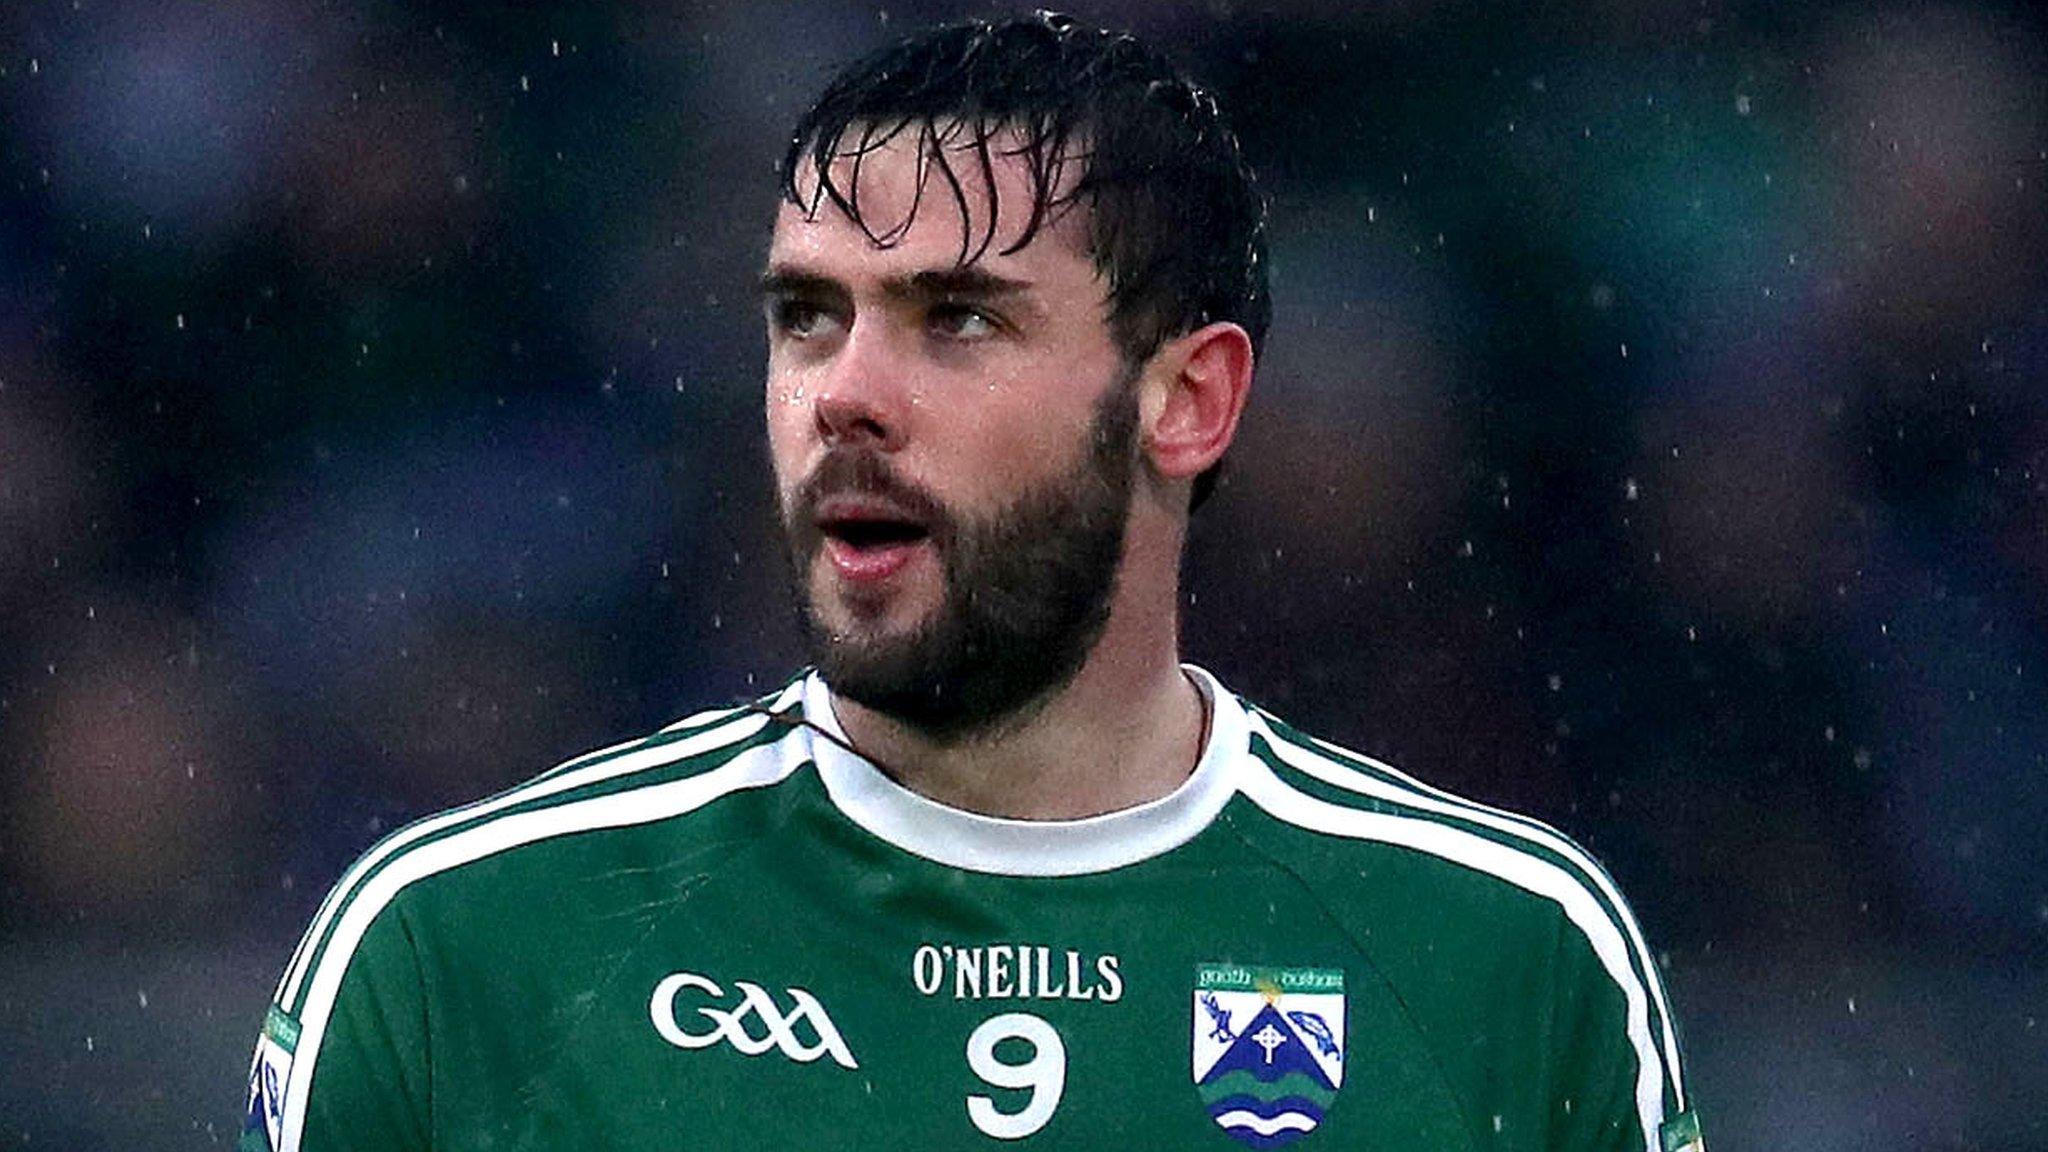 All-Ireland Club SFC semi-final: Gaoth Dobhair face huge Corofin test